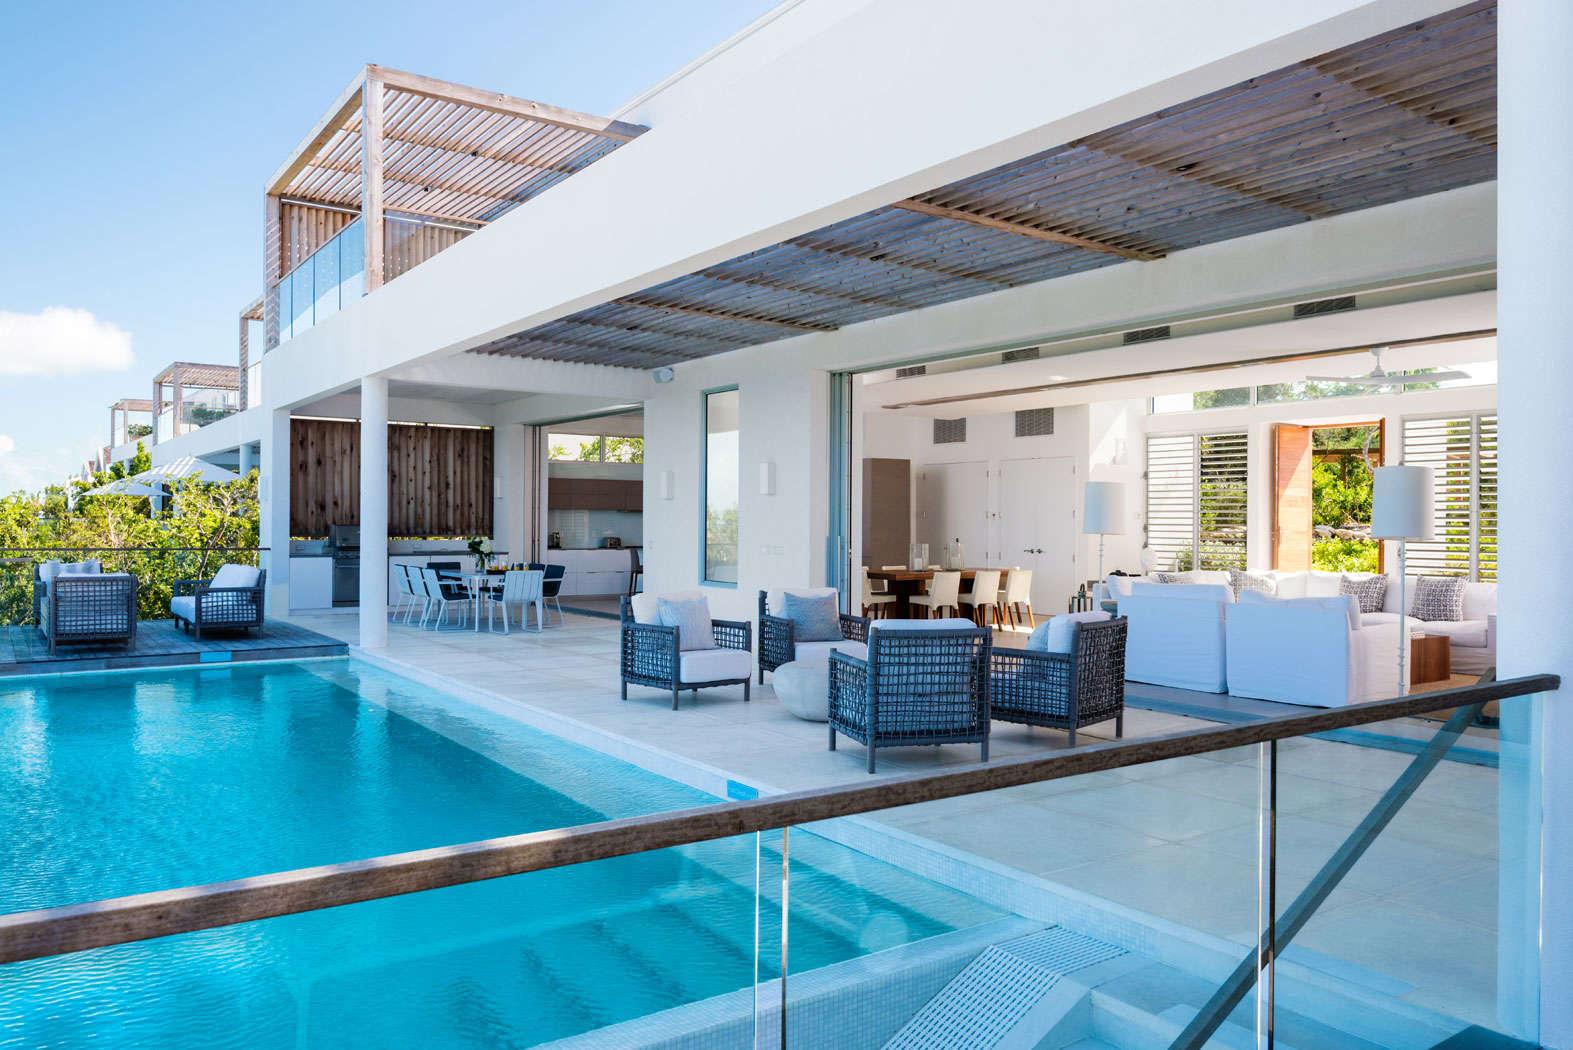 Luxury villa rentals caribbean - Turks and caicos - Providenciales - Babalua beach - Beach Enclave 4 Bedroom Beachfront Villa - Image 1/17